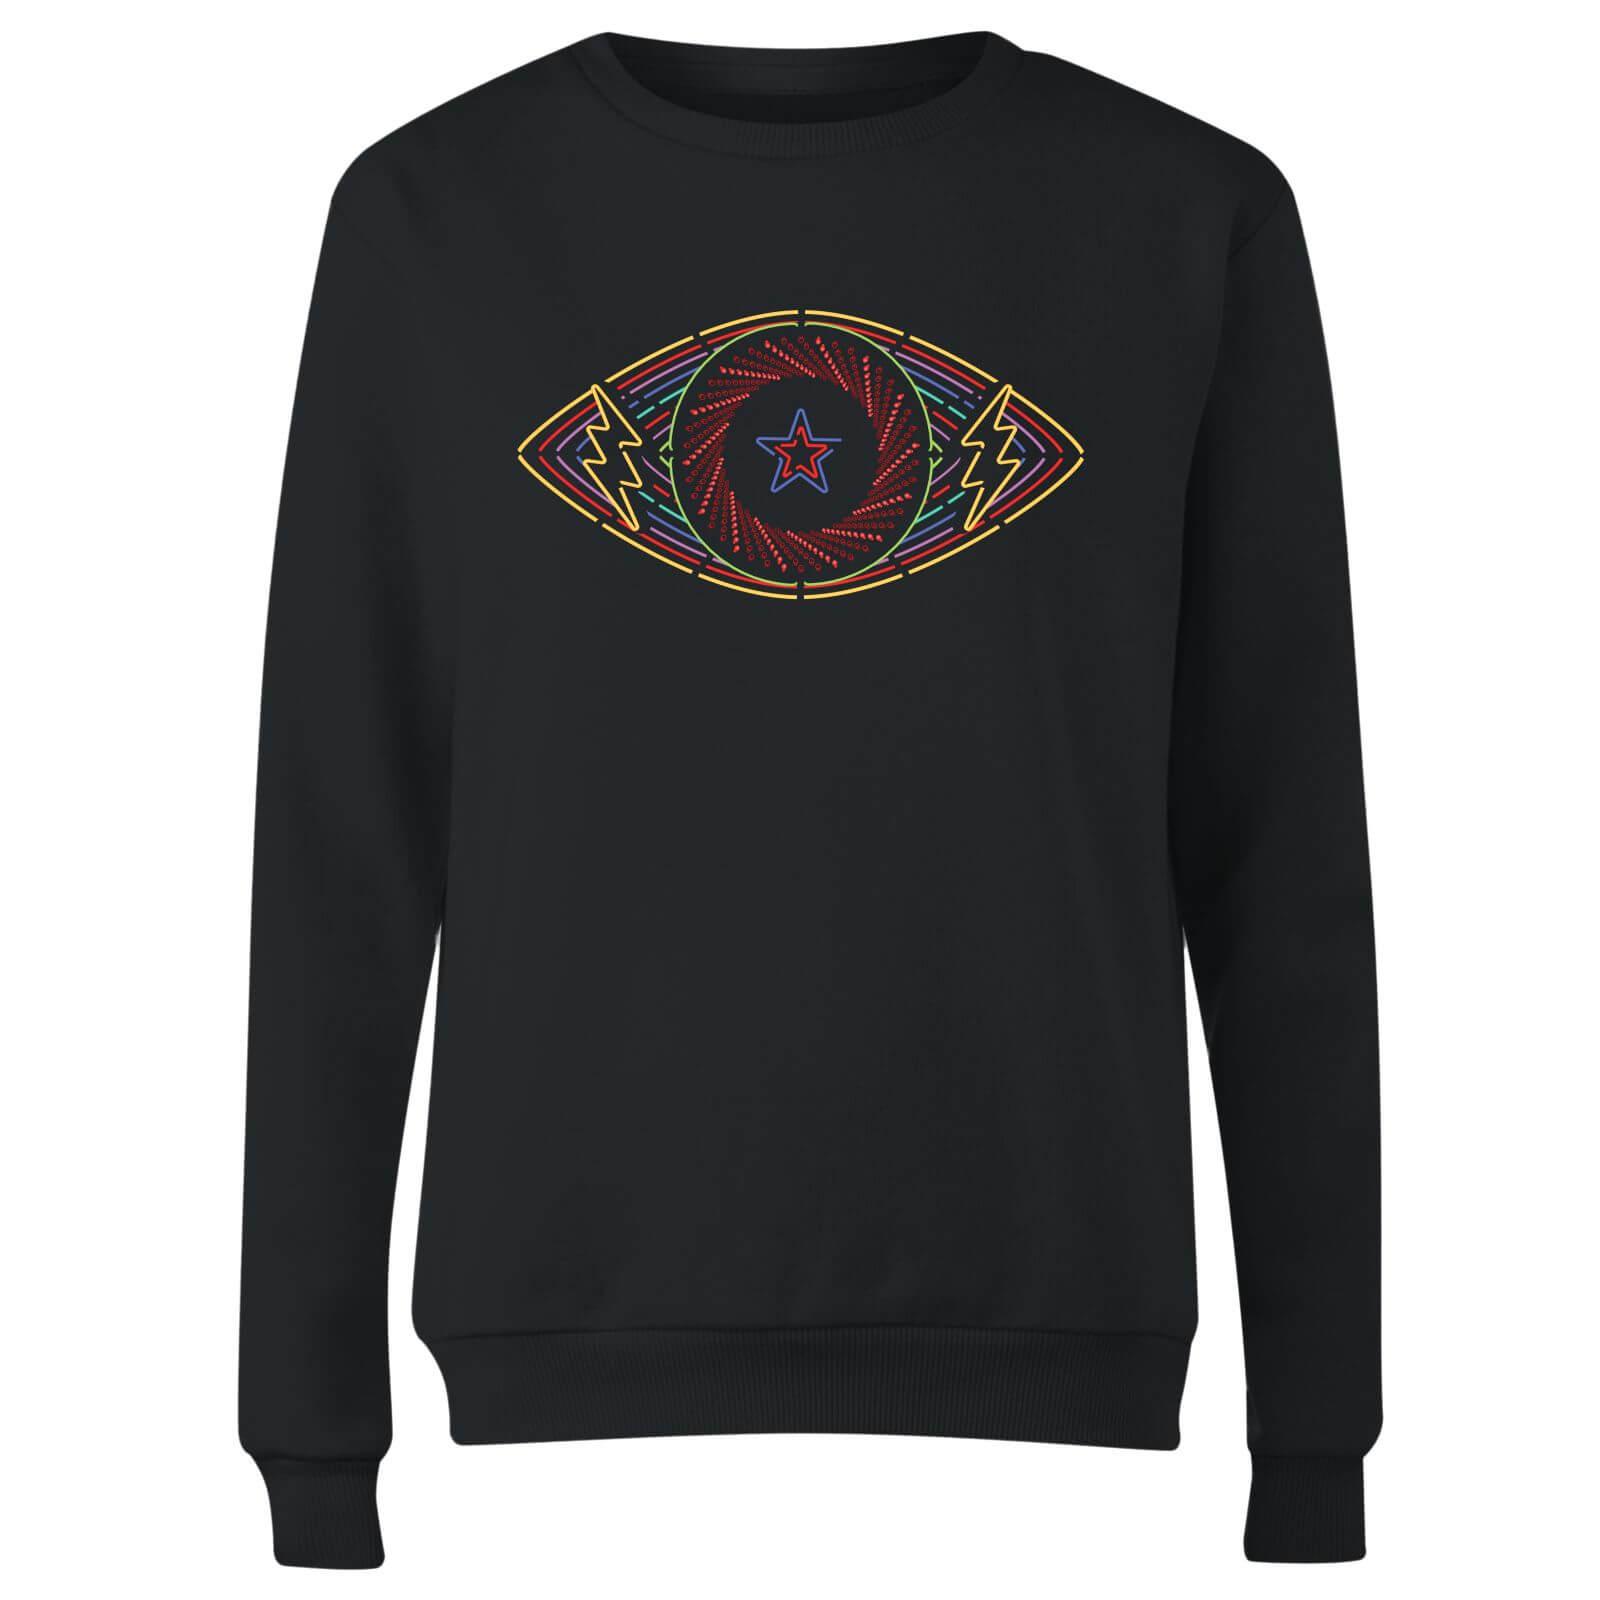 Celebrity Big Brother Eye Women's Sweatshirt - Black - 5XL - Black